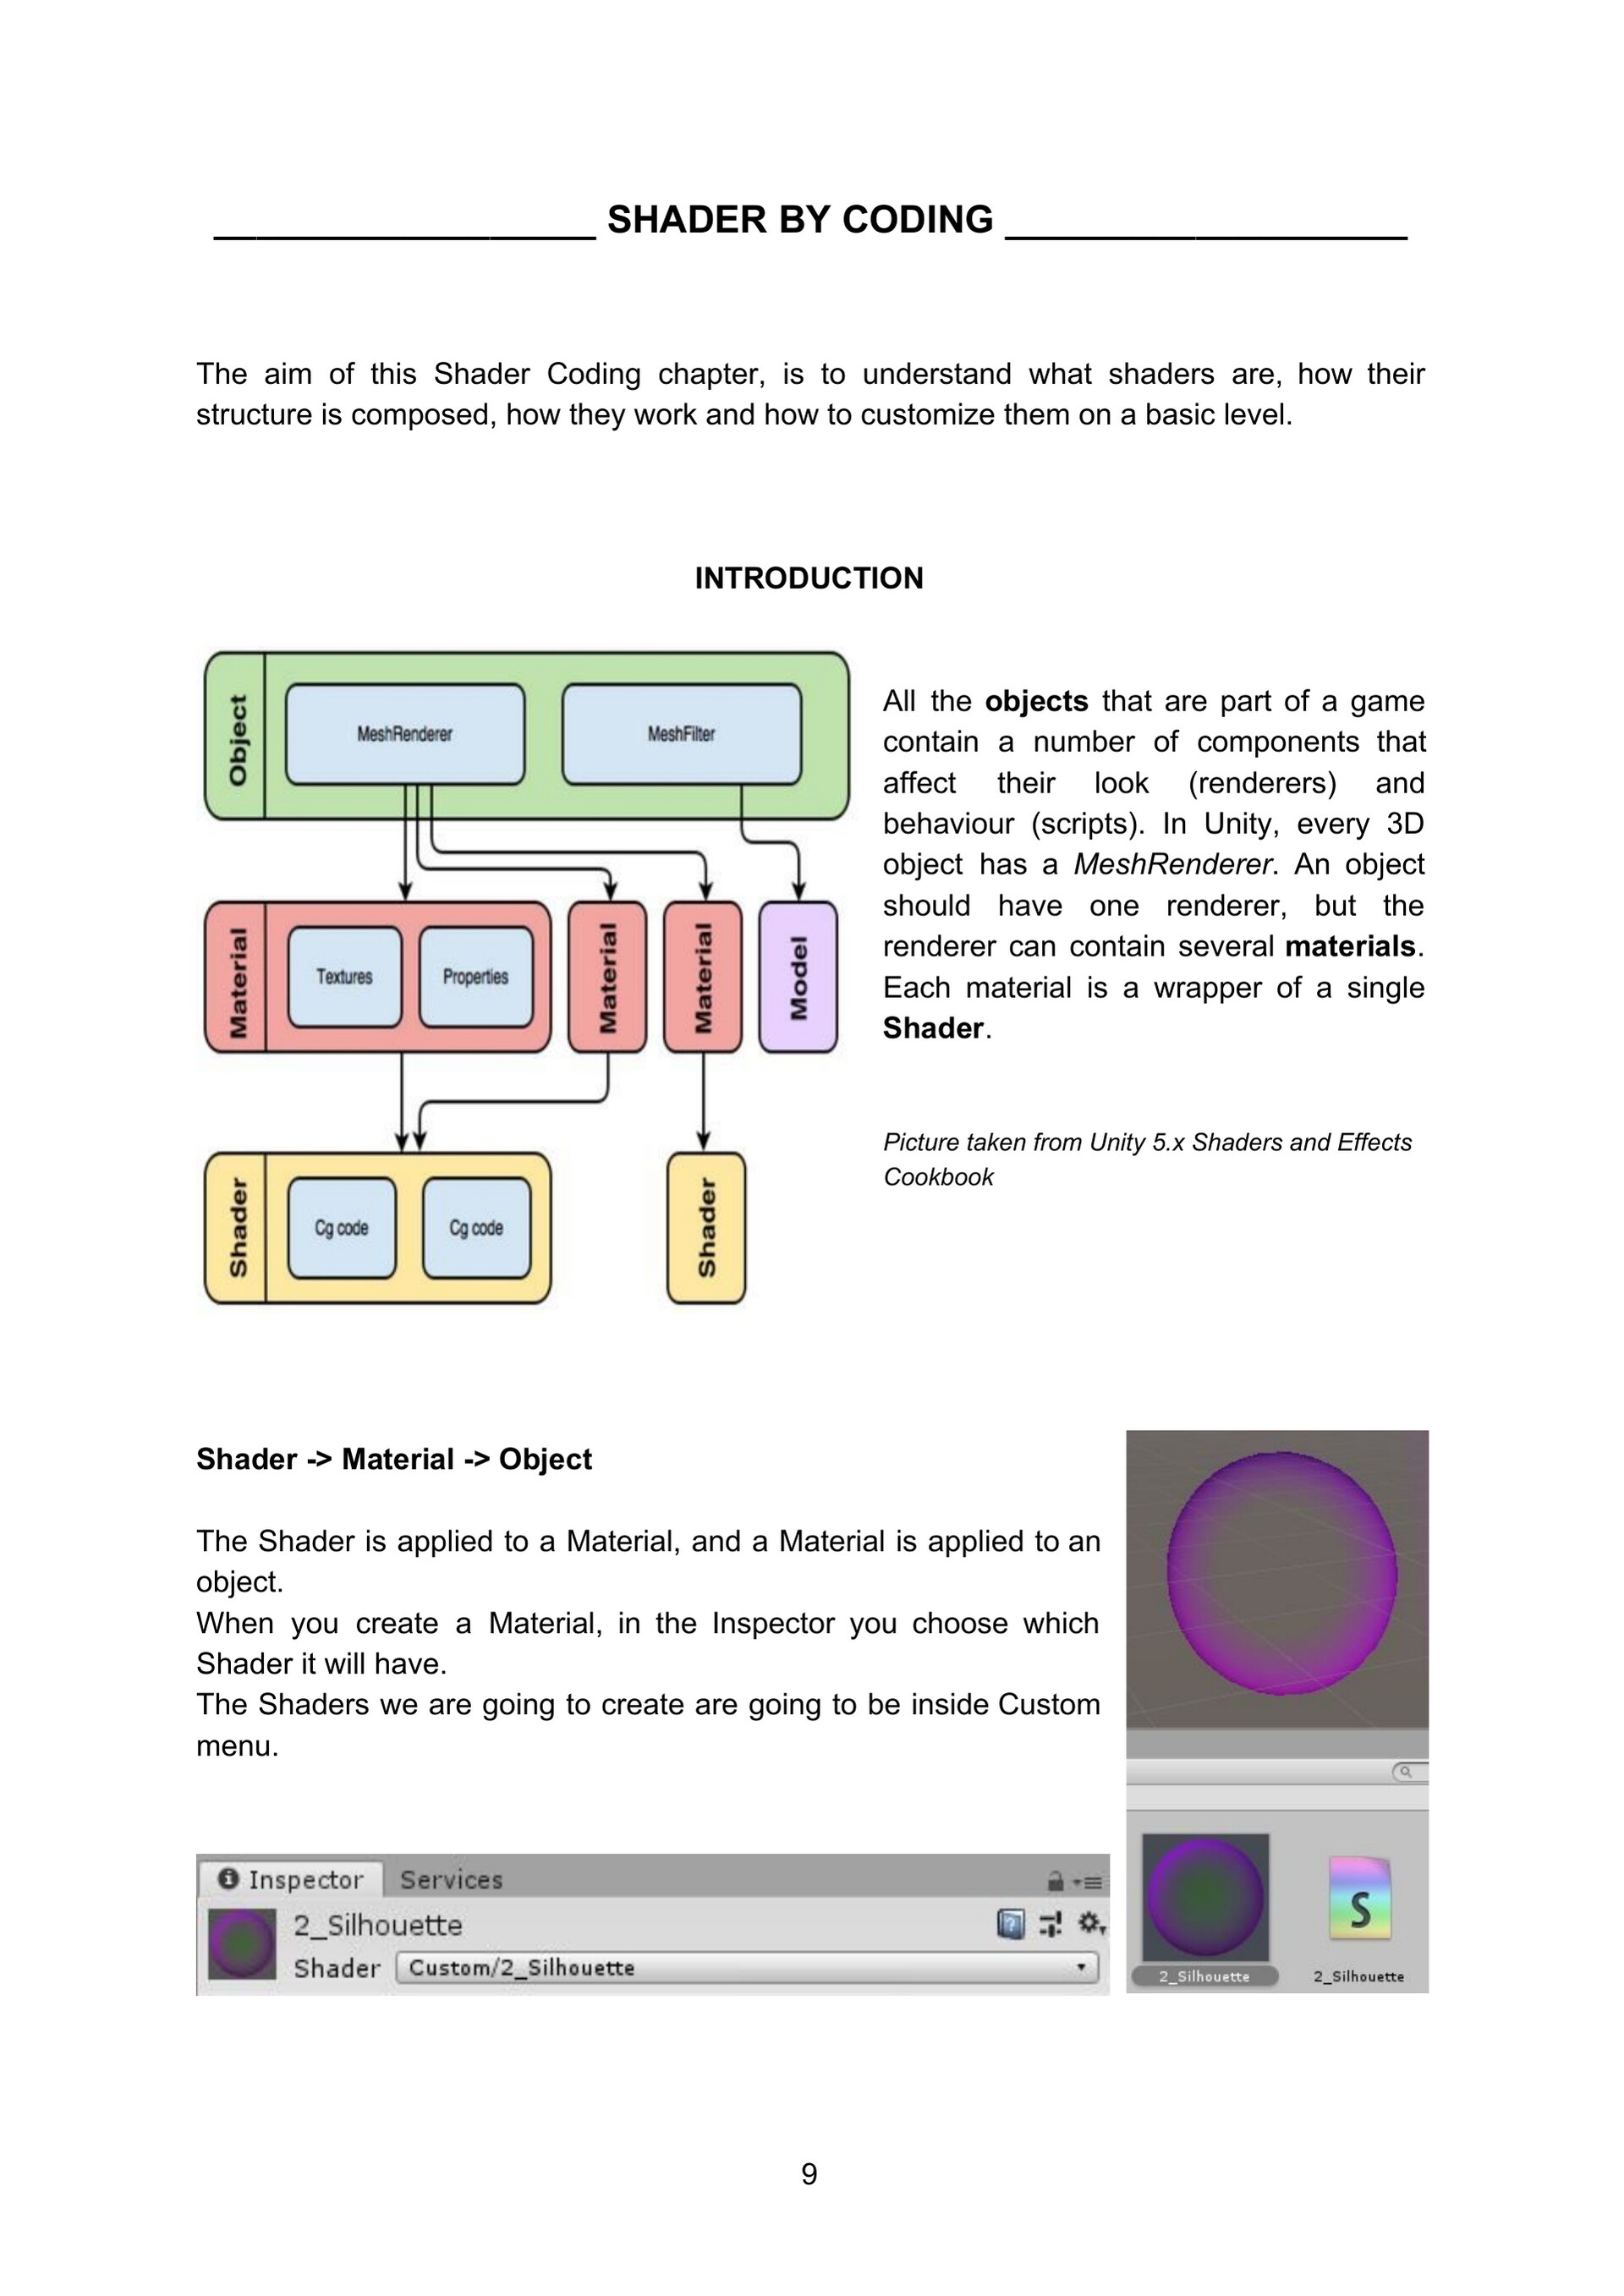 aitor mendia - Shader Coding Introduction Basics